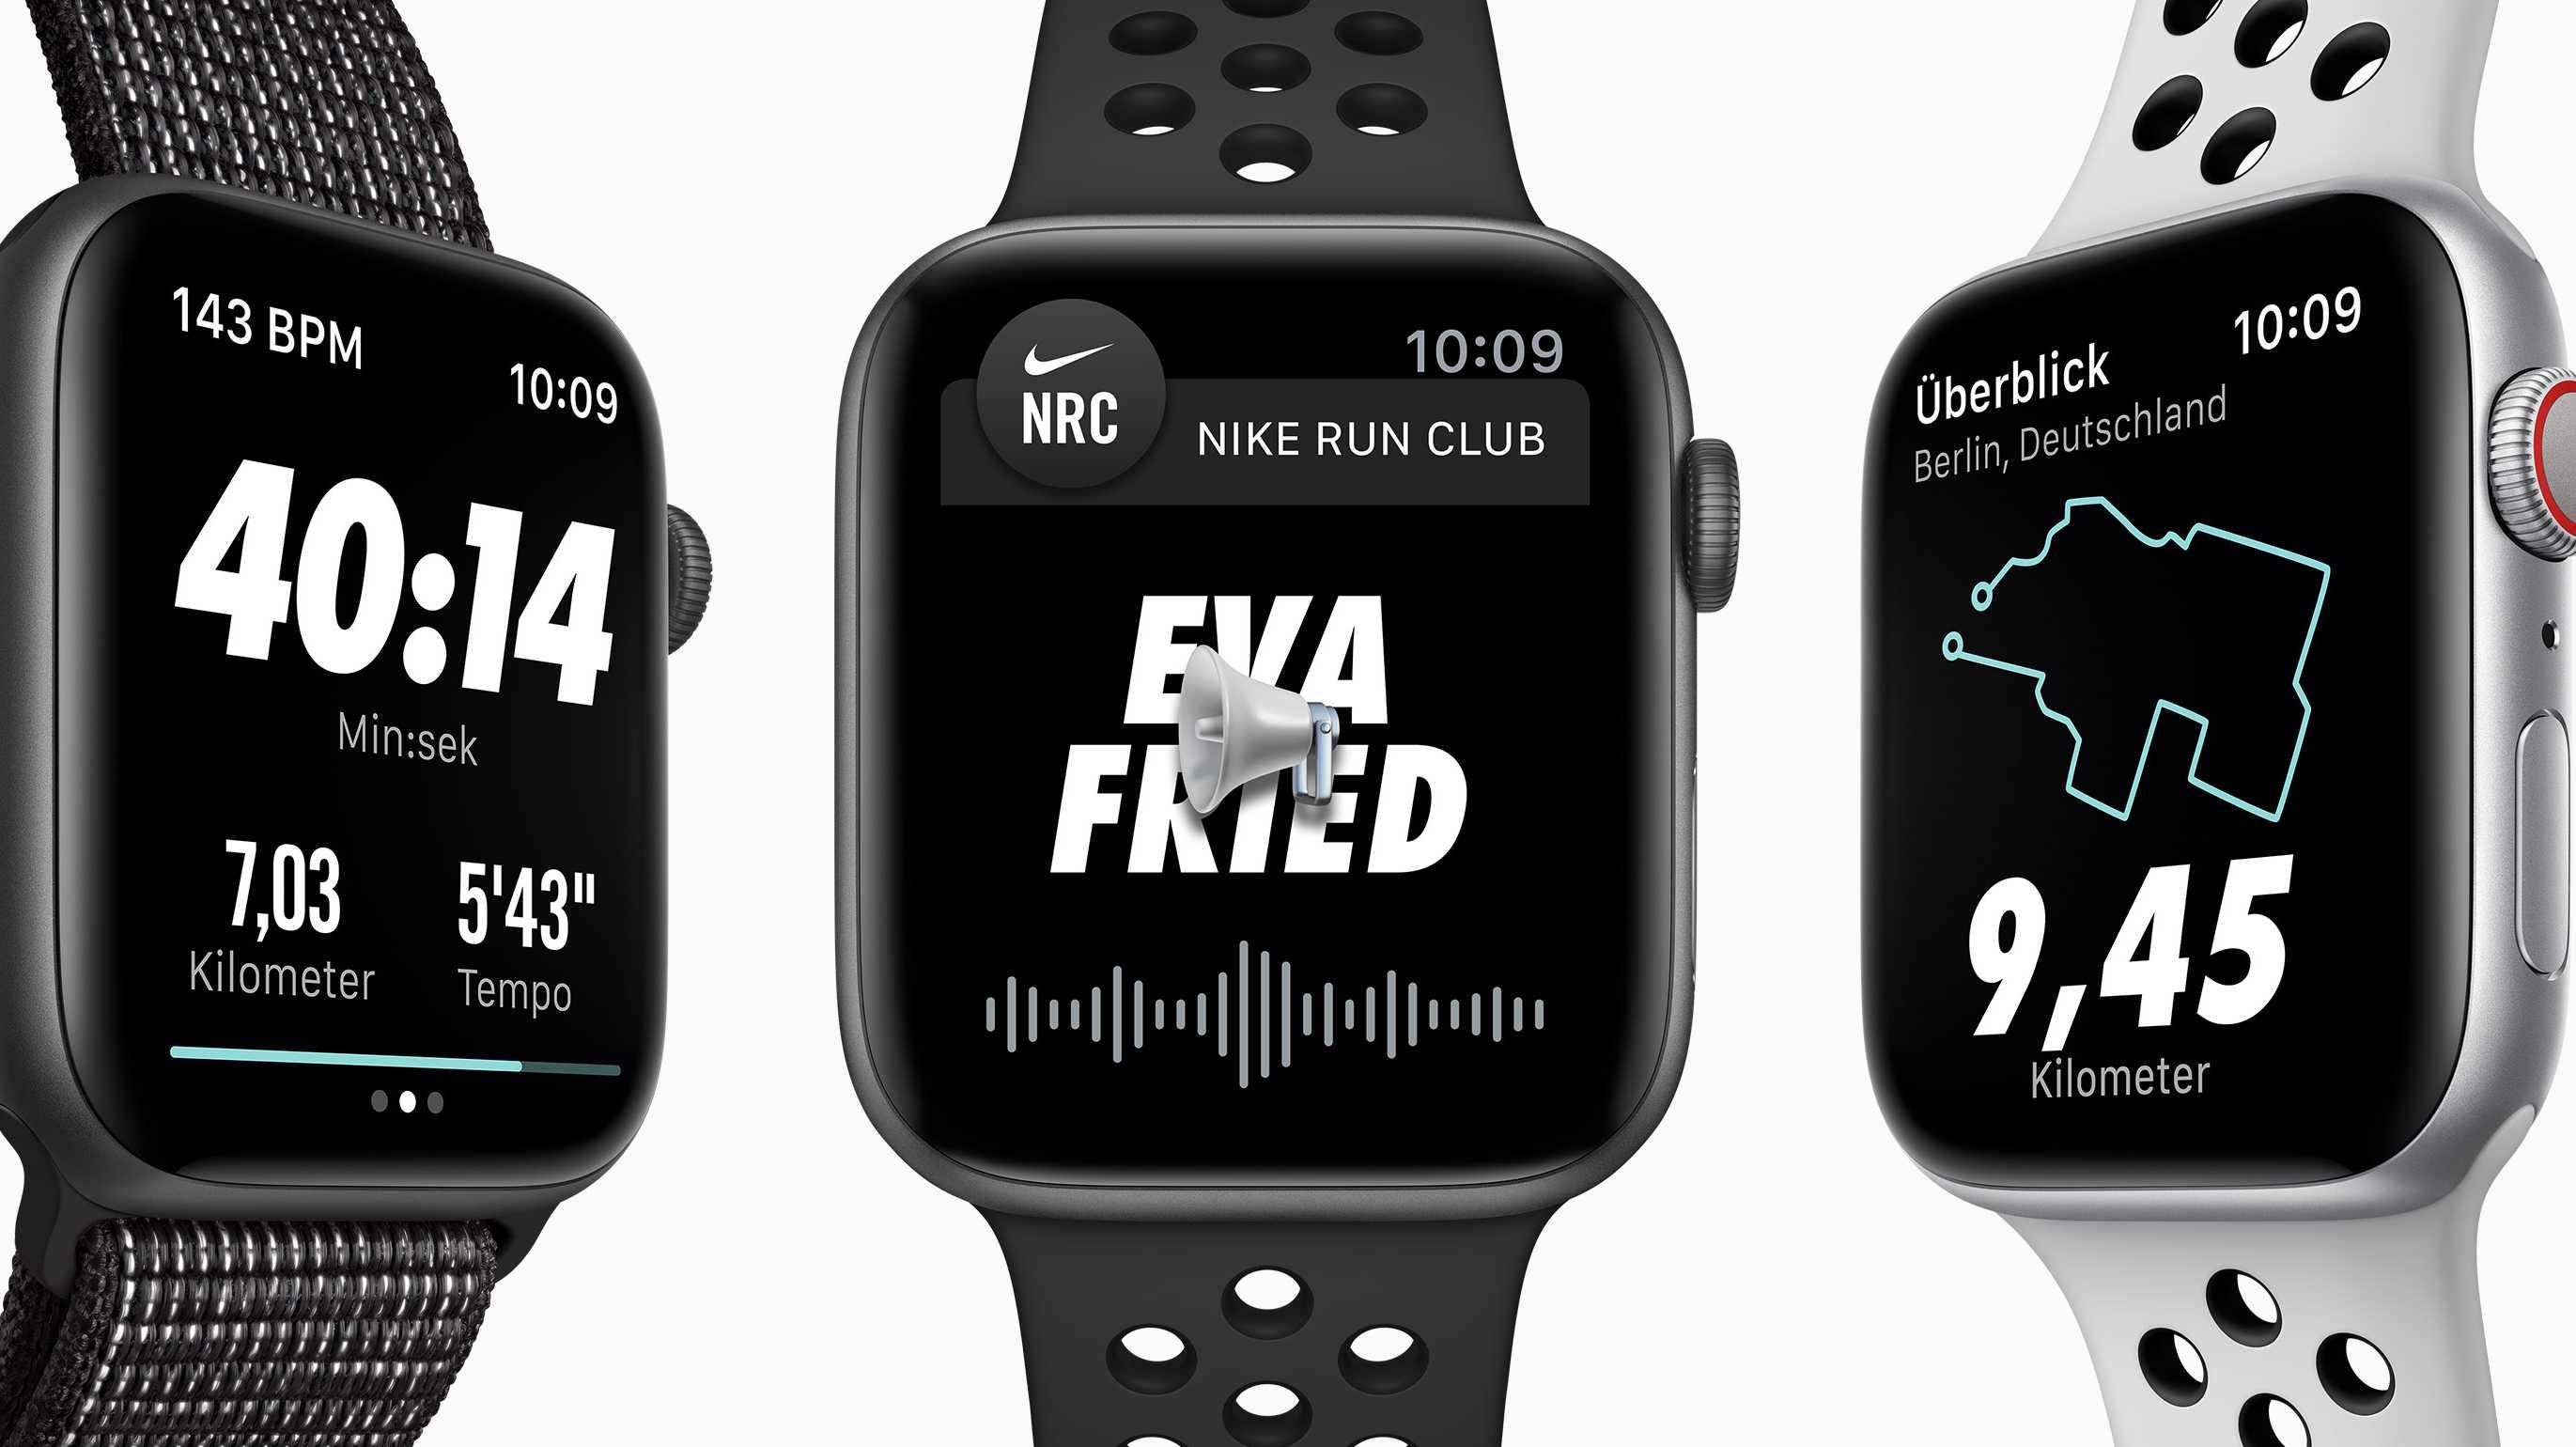 Dritte Variante der Apple Watch Series 4 verfügbar